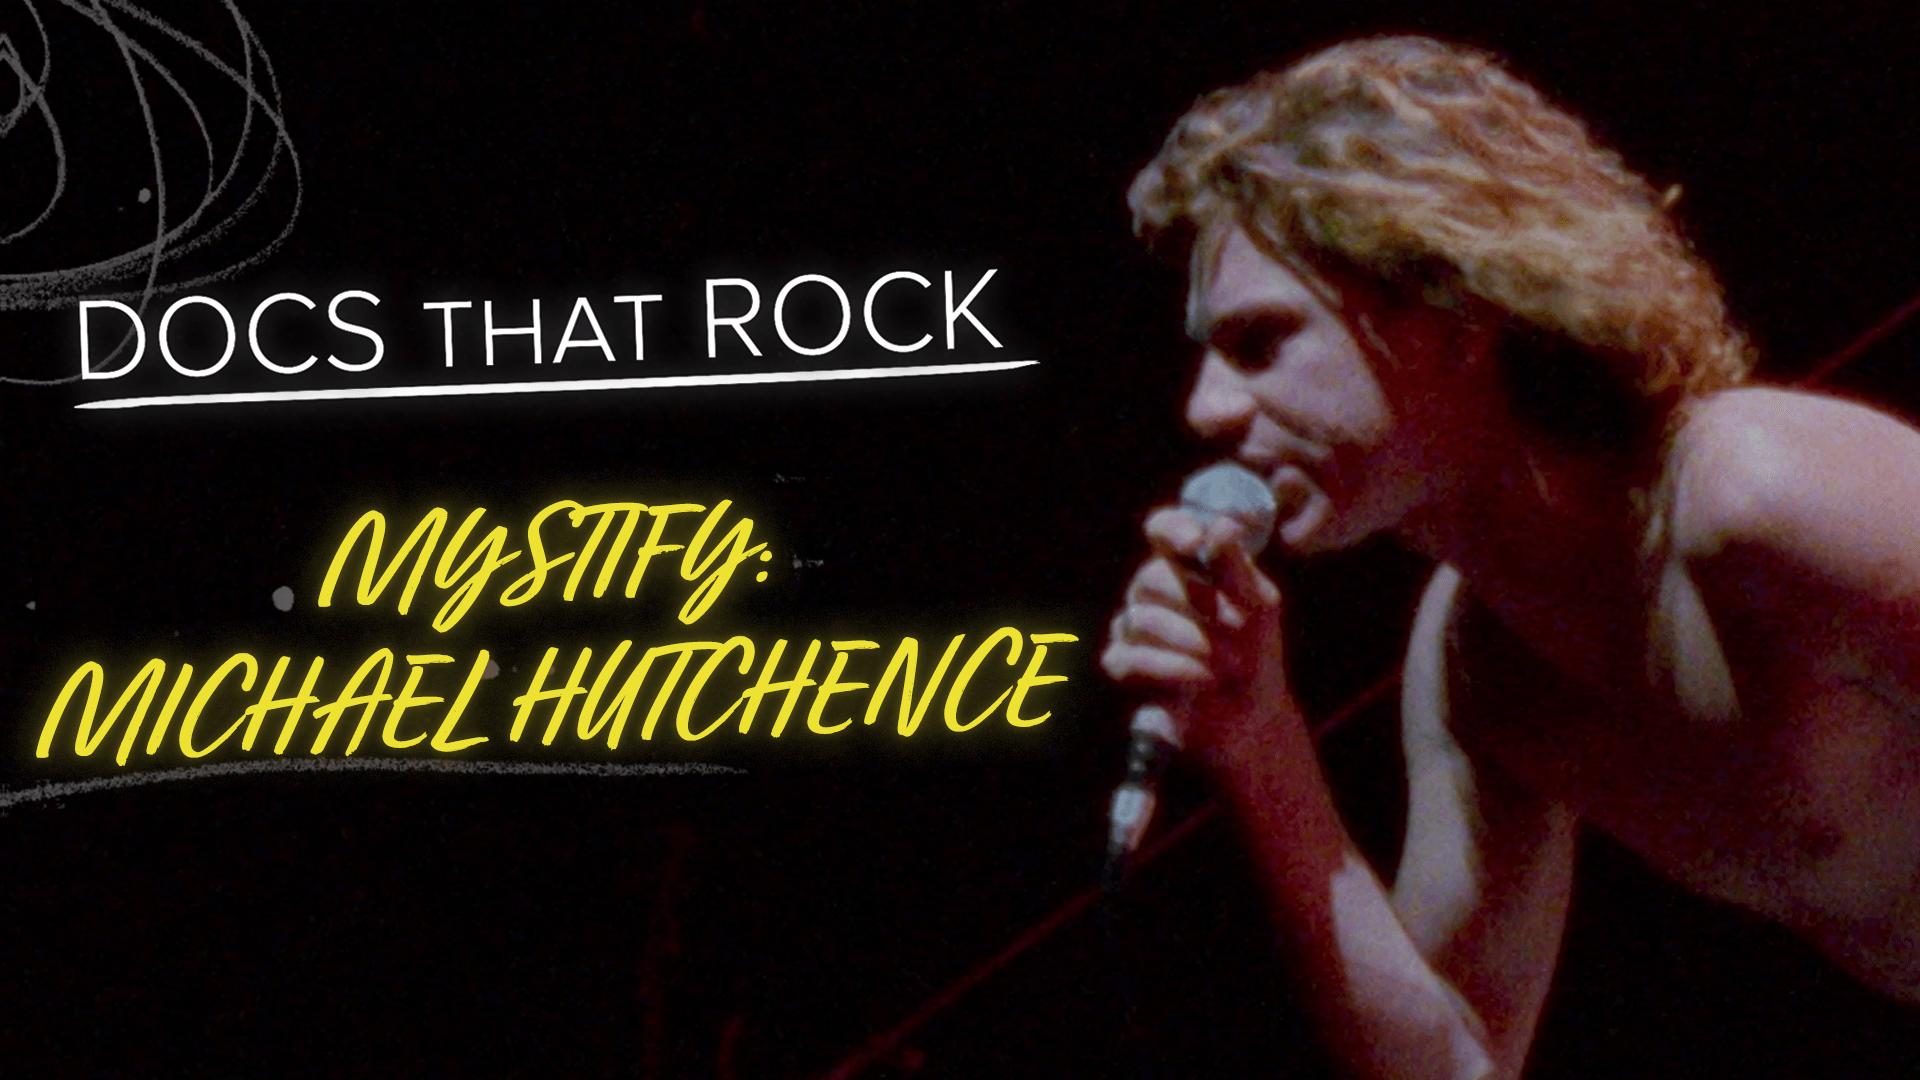 Mystify: Michael Hutchence Trailer | Docs That Rock